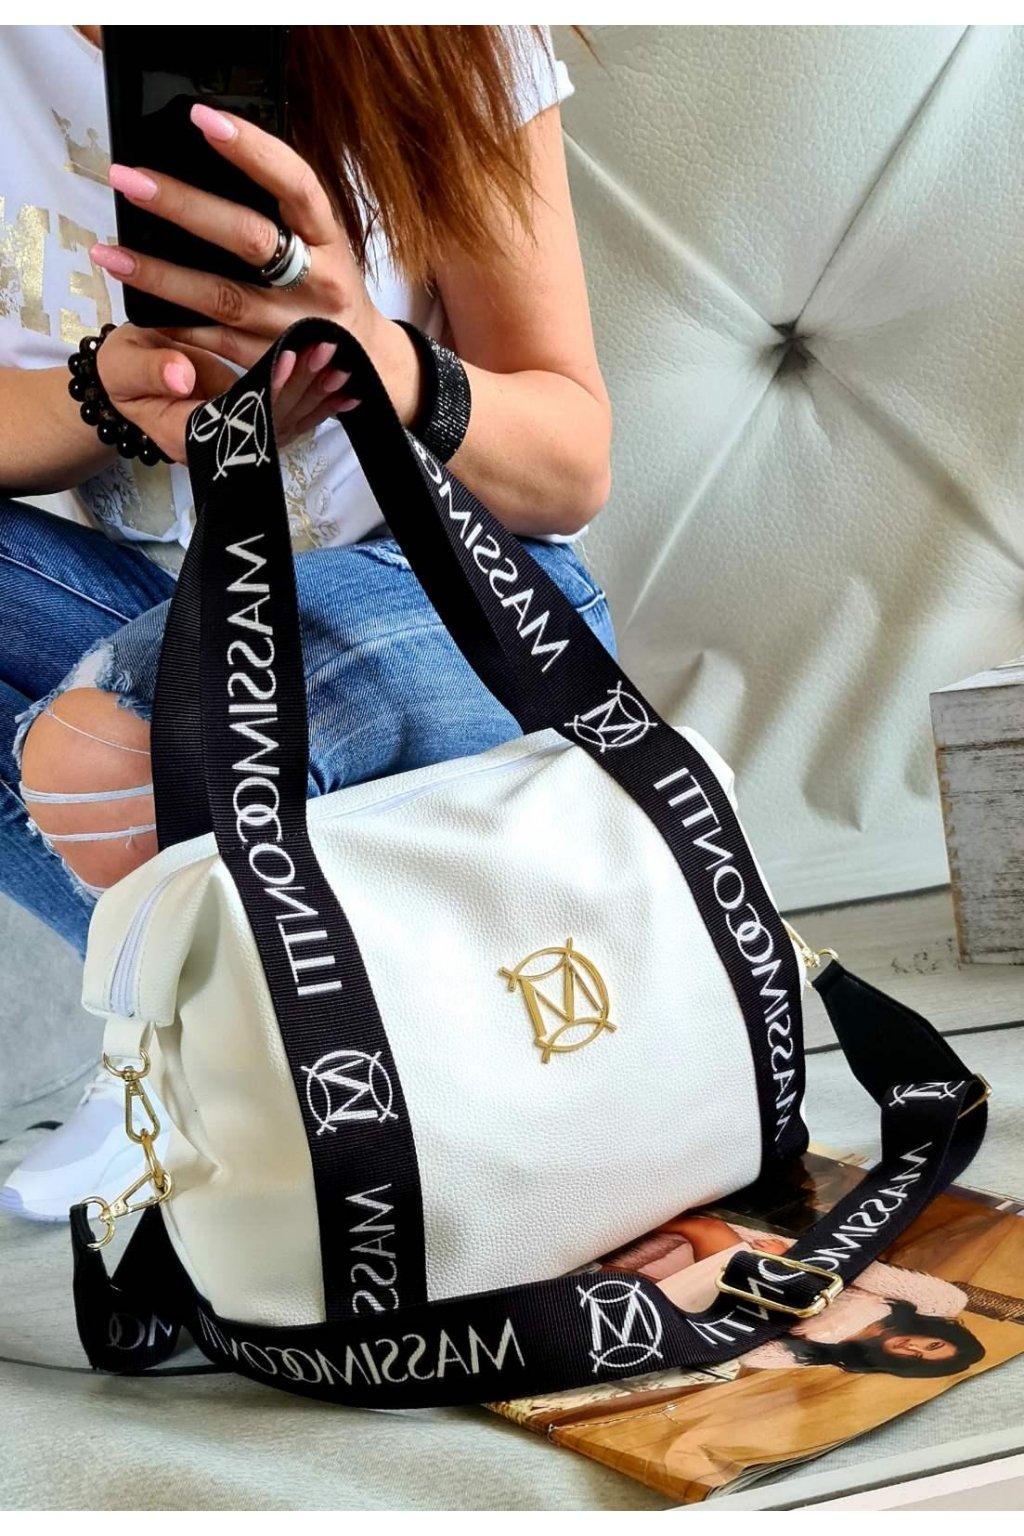 kabelka massimo contti fashion trendy italy style fashion luxusní kabelka luxury bílá